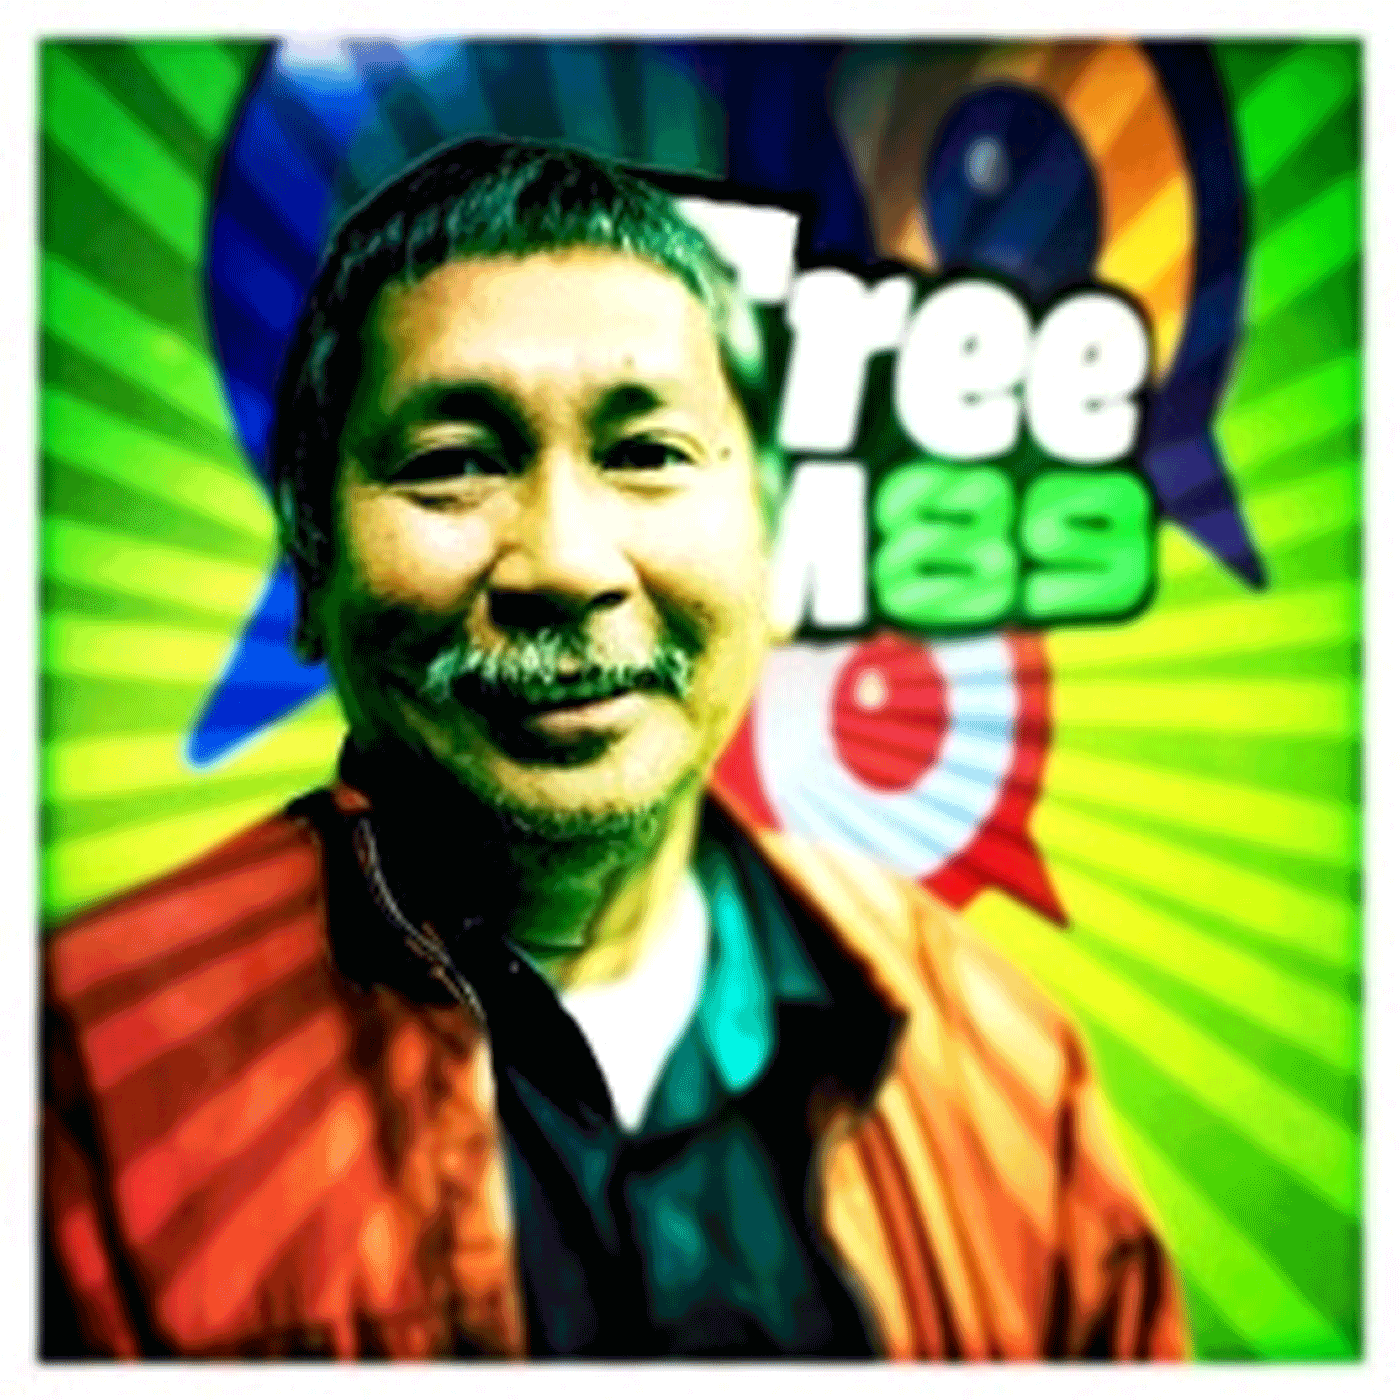 https://cdn.accessradio.org/StationFolder/freefm89/Images/BarangayNZ.png